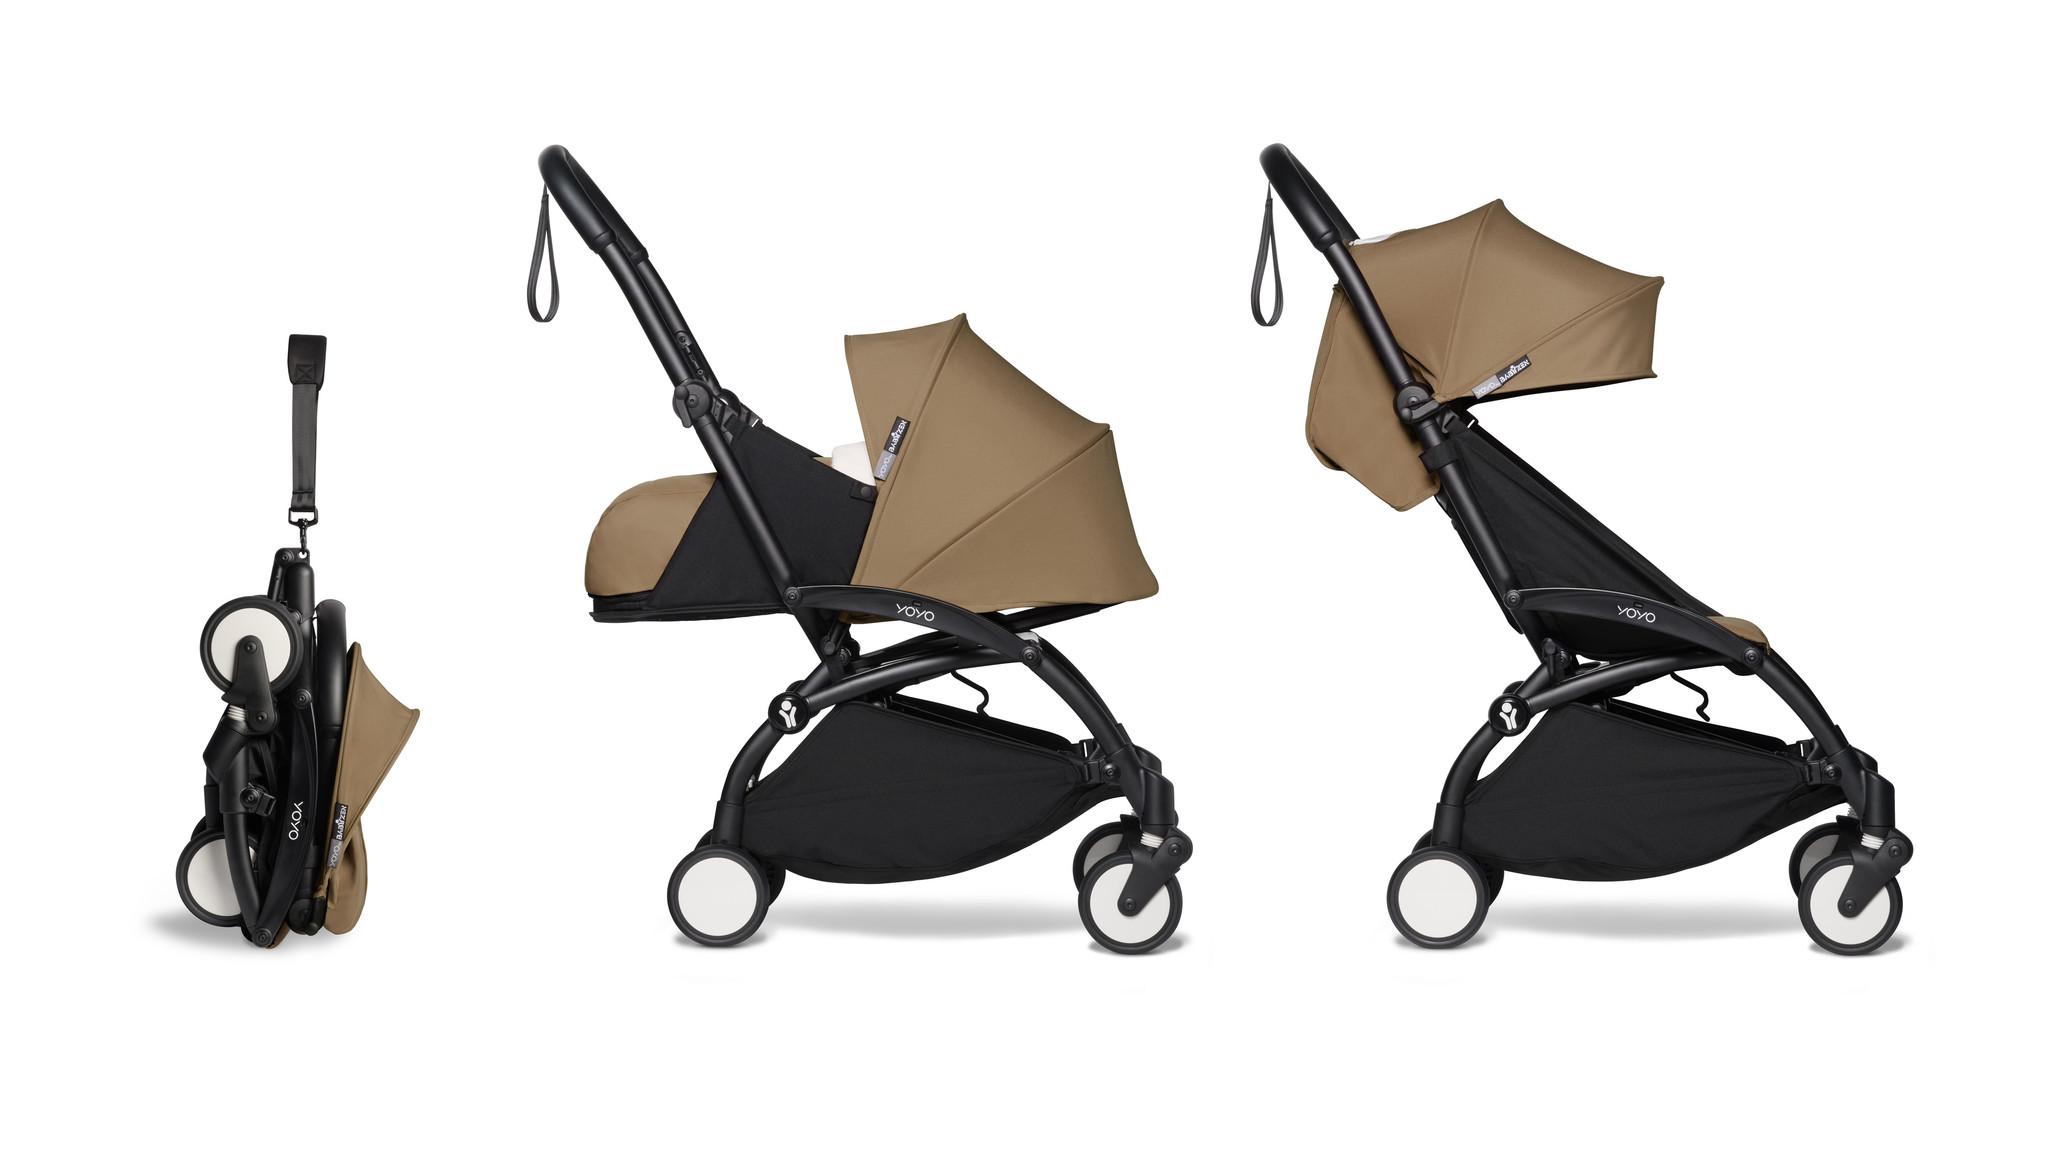 Babyzen Babyzen YOYO² buggy COMPLEET / FULL SET 0+ and 6+ toffee frame zwart